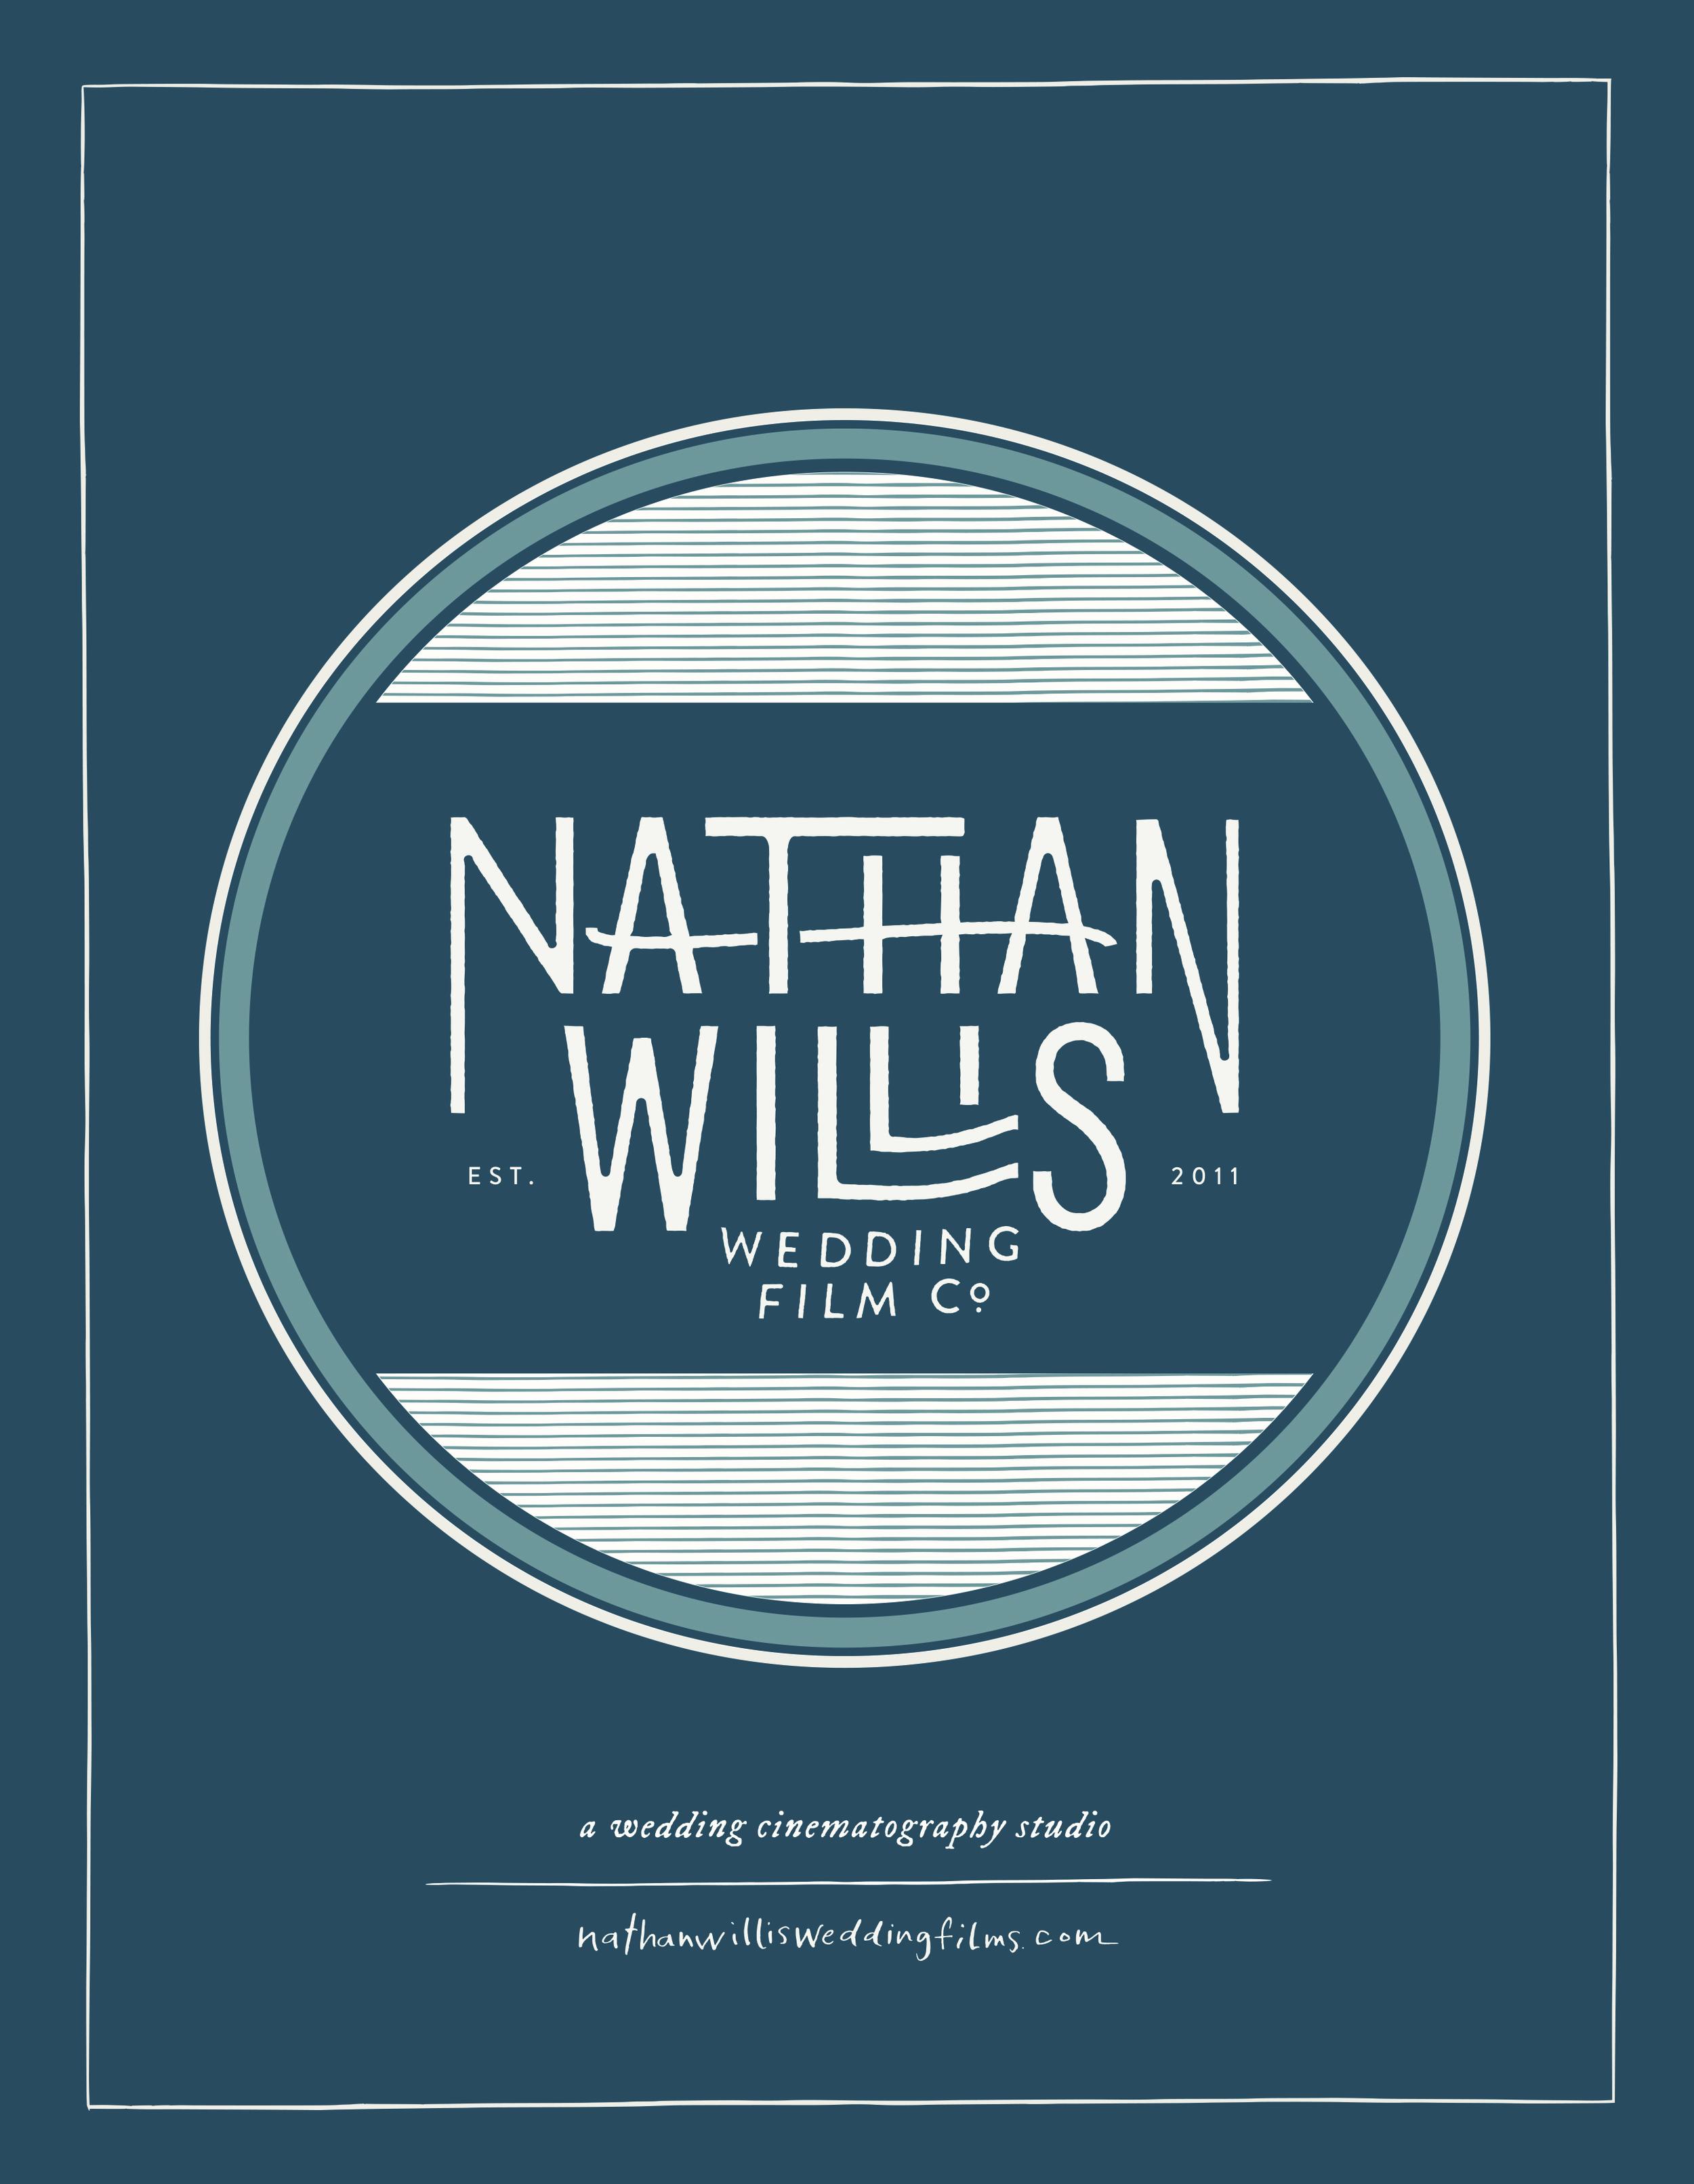 southern-weddings-ad-nathan-willis-wedding-films.jpg